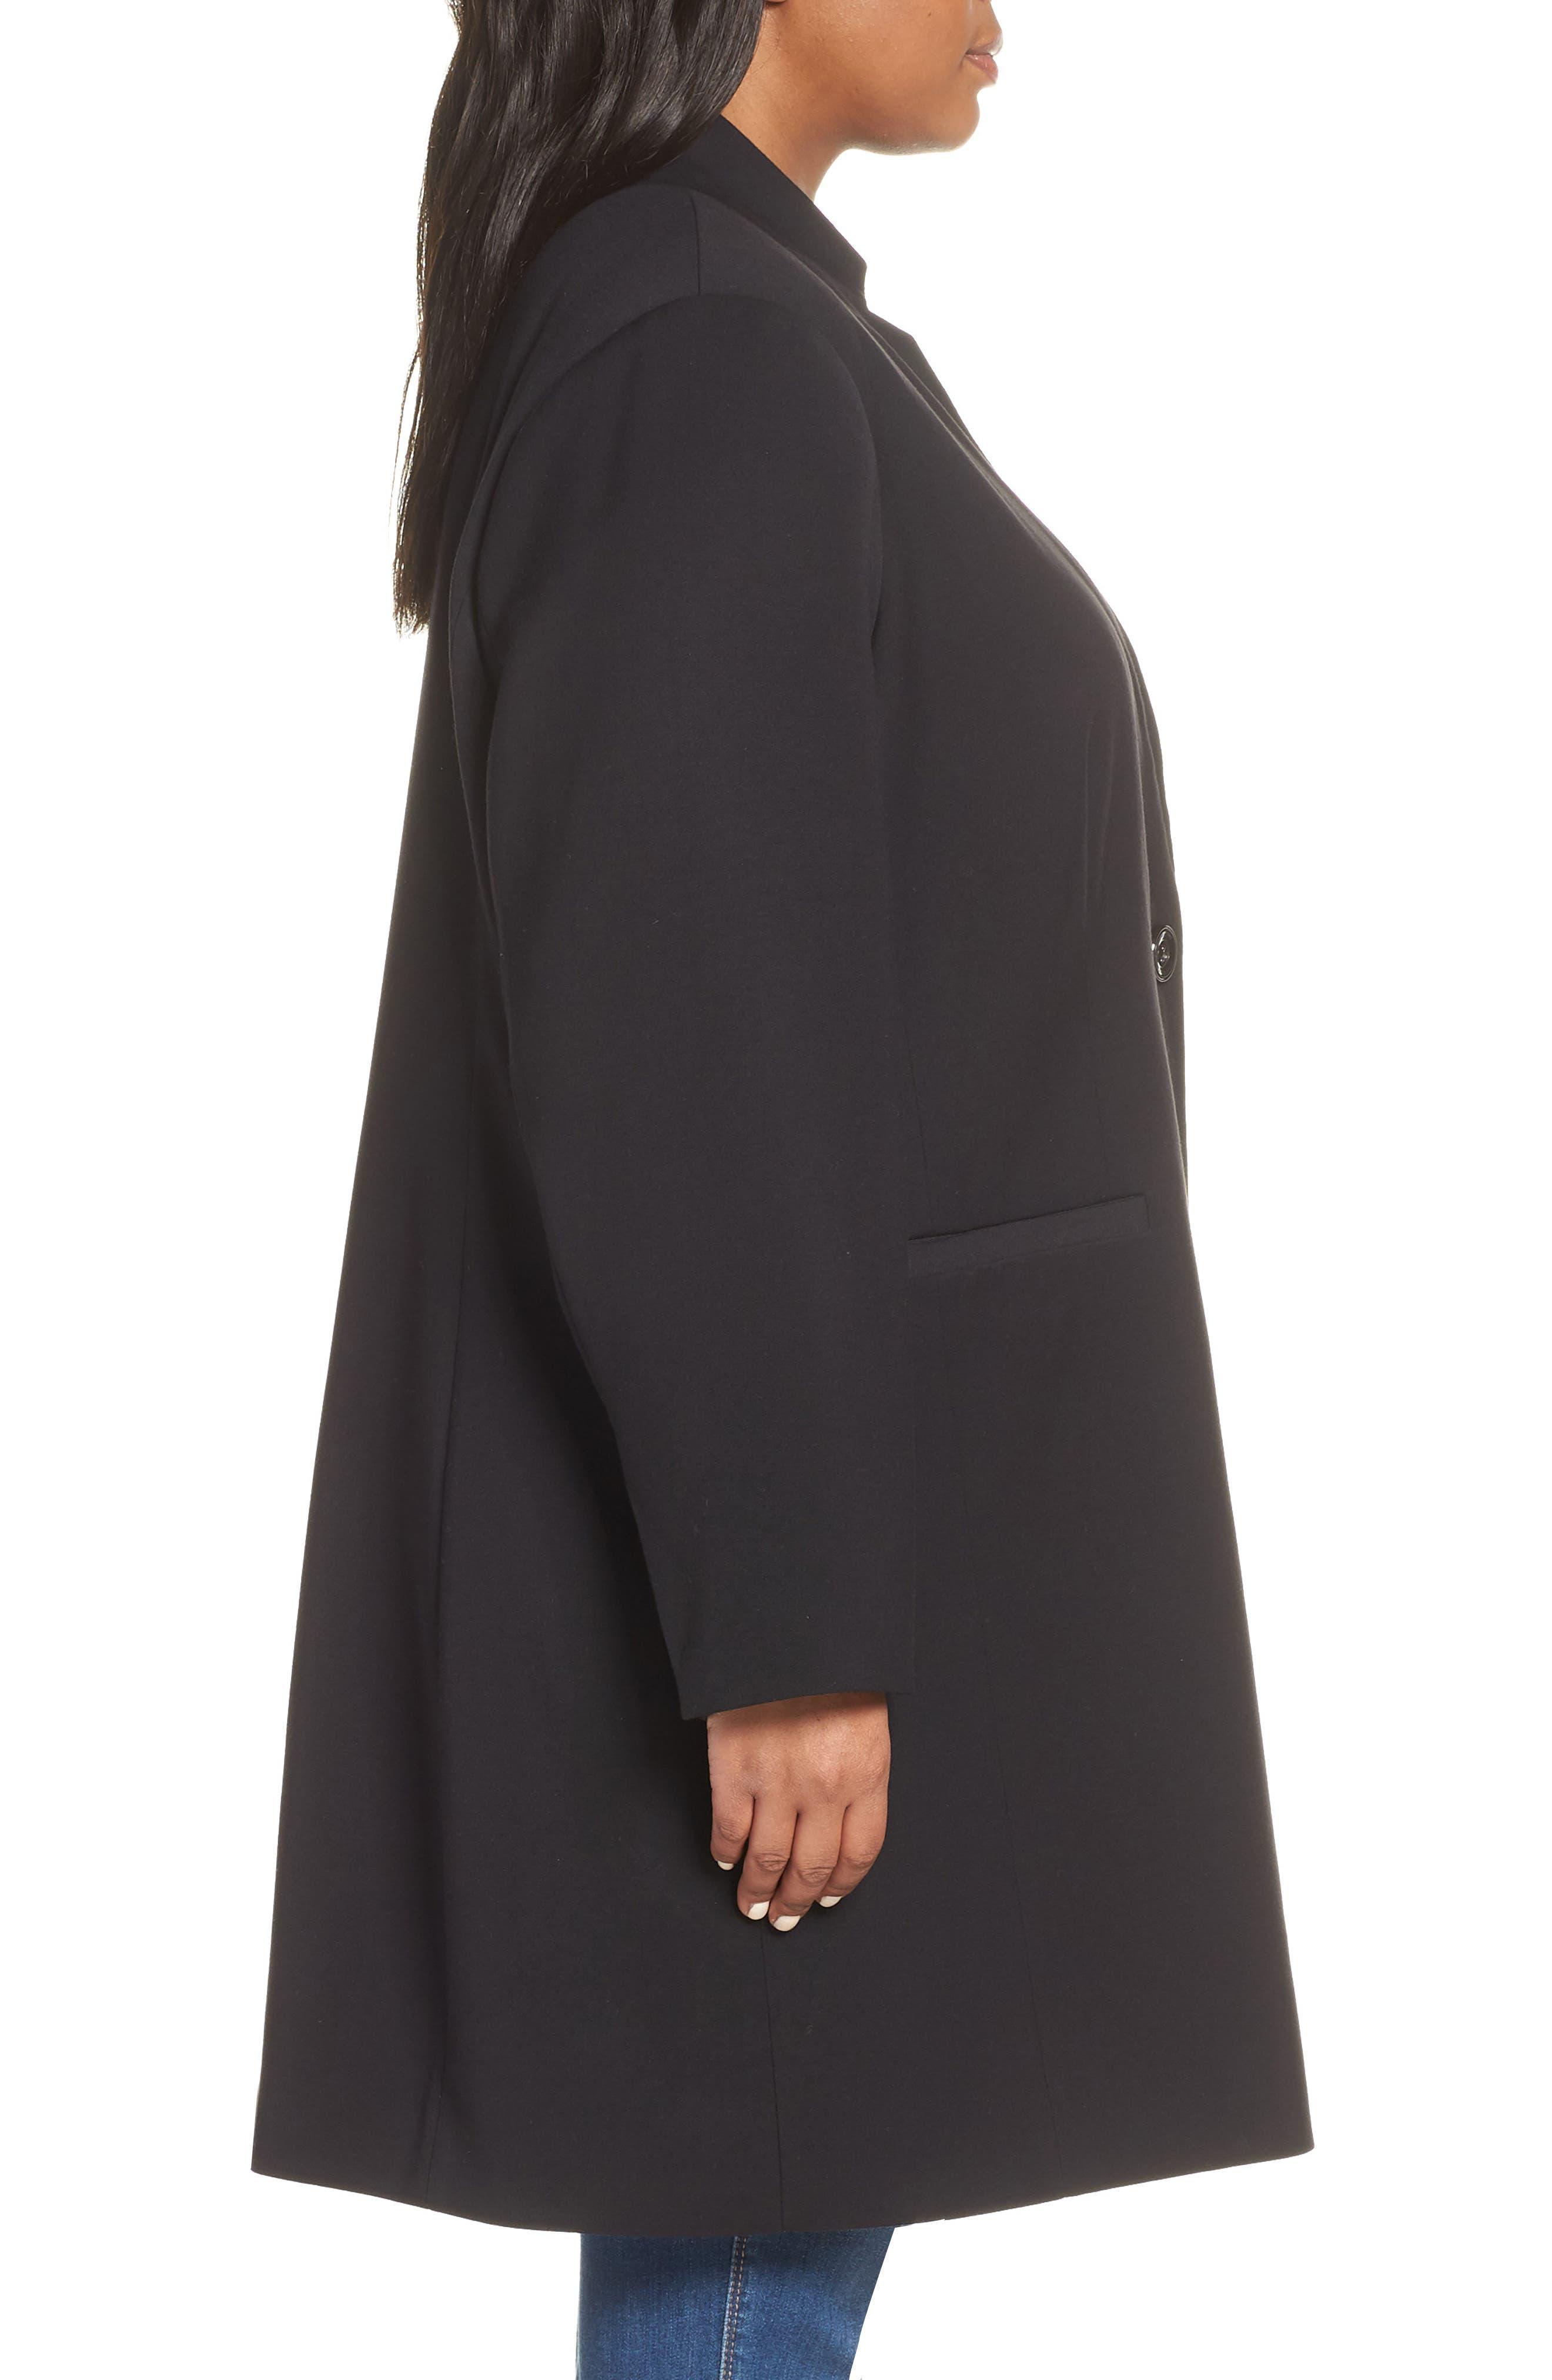 KENNETH COLE NEW YORK,                             Inverted Collar Ponte Jacket,                             Alternate thumbnail 3, color,                             BLACK